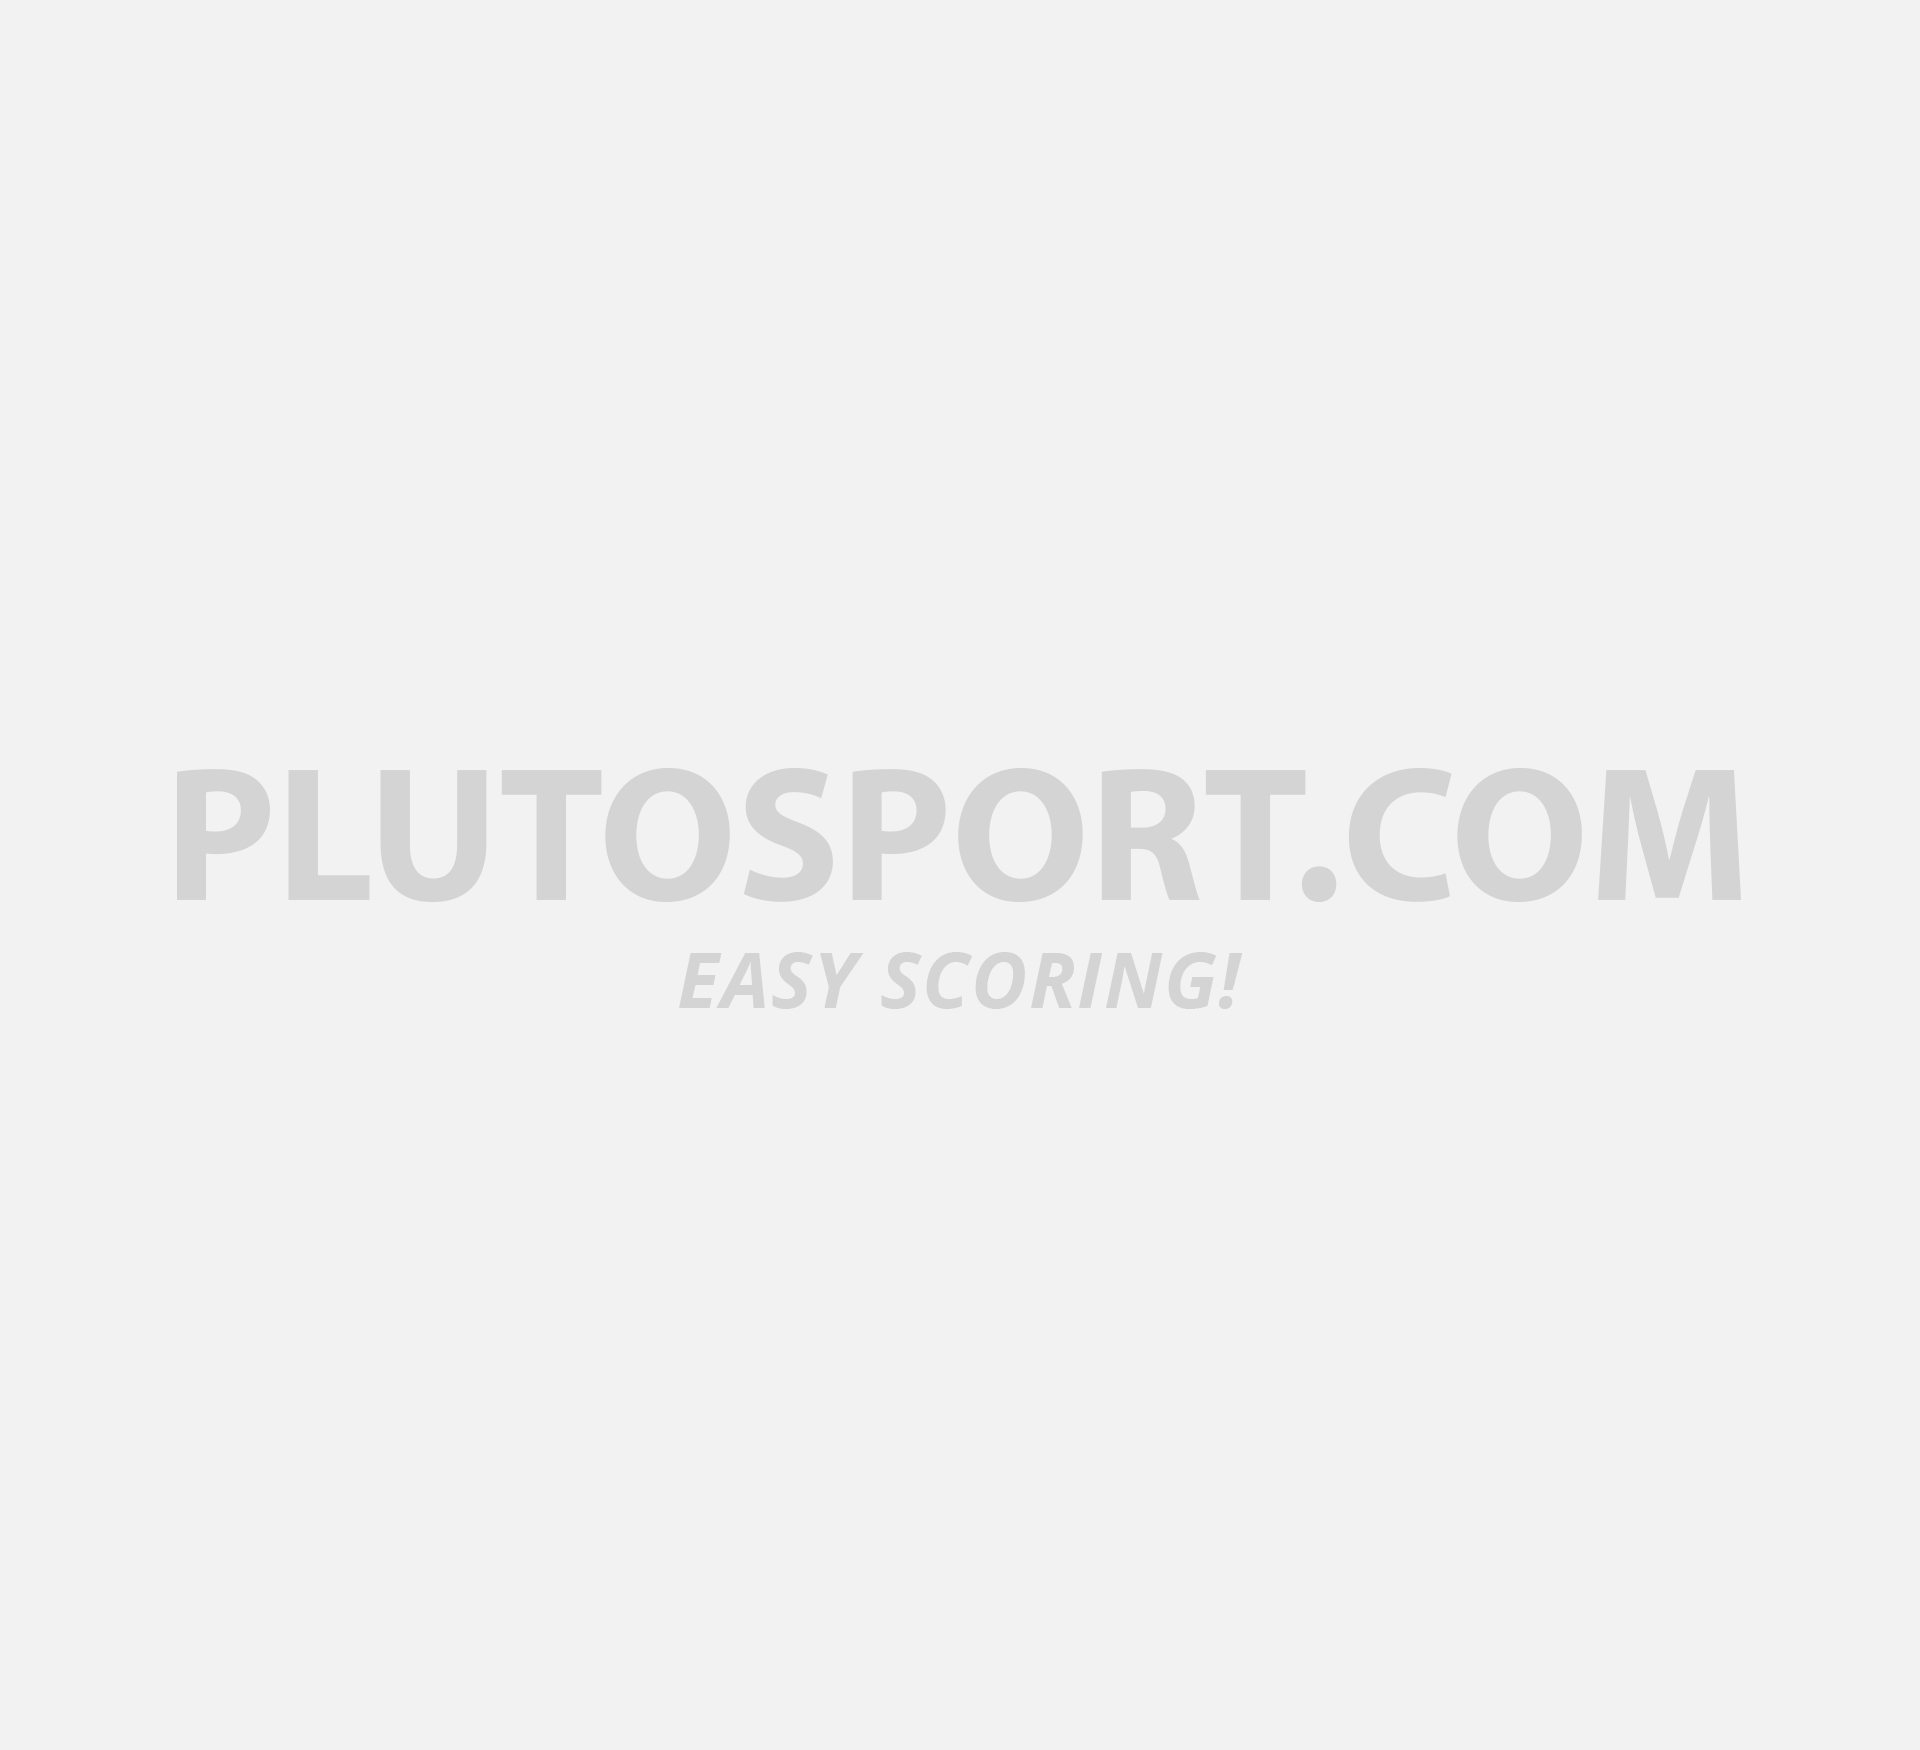 Nike Swoosh Sport Headbands 2.0 (3-pack) - Sweatbands - Accessories -  Fitness - Women  f6824c41afc